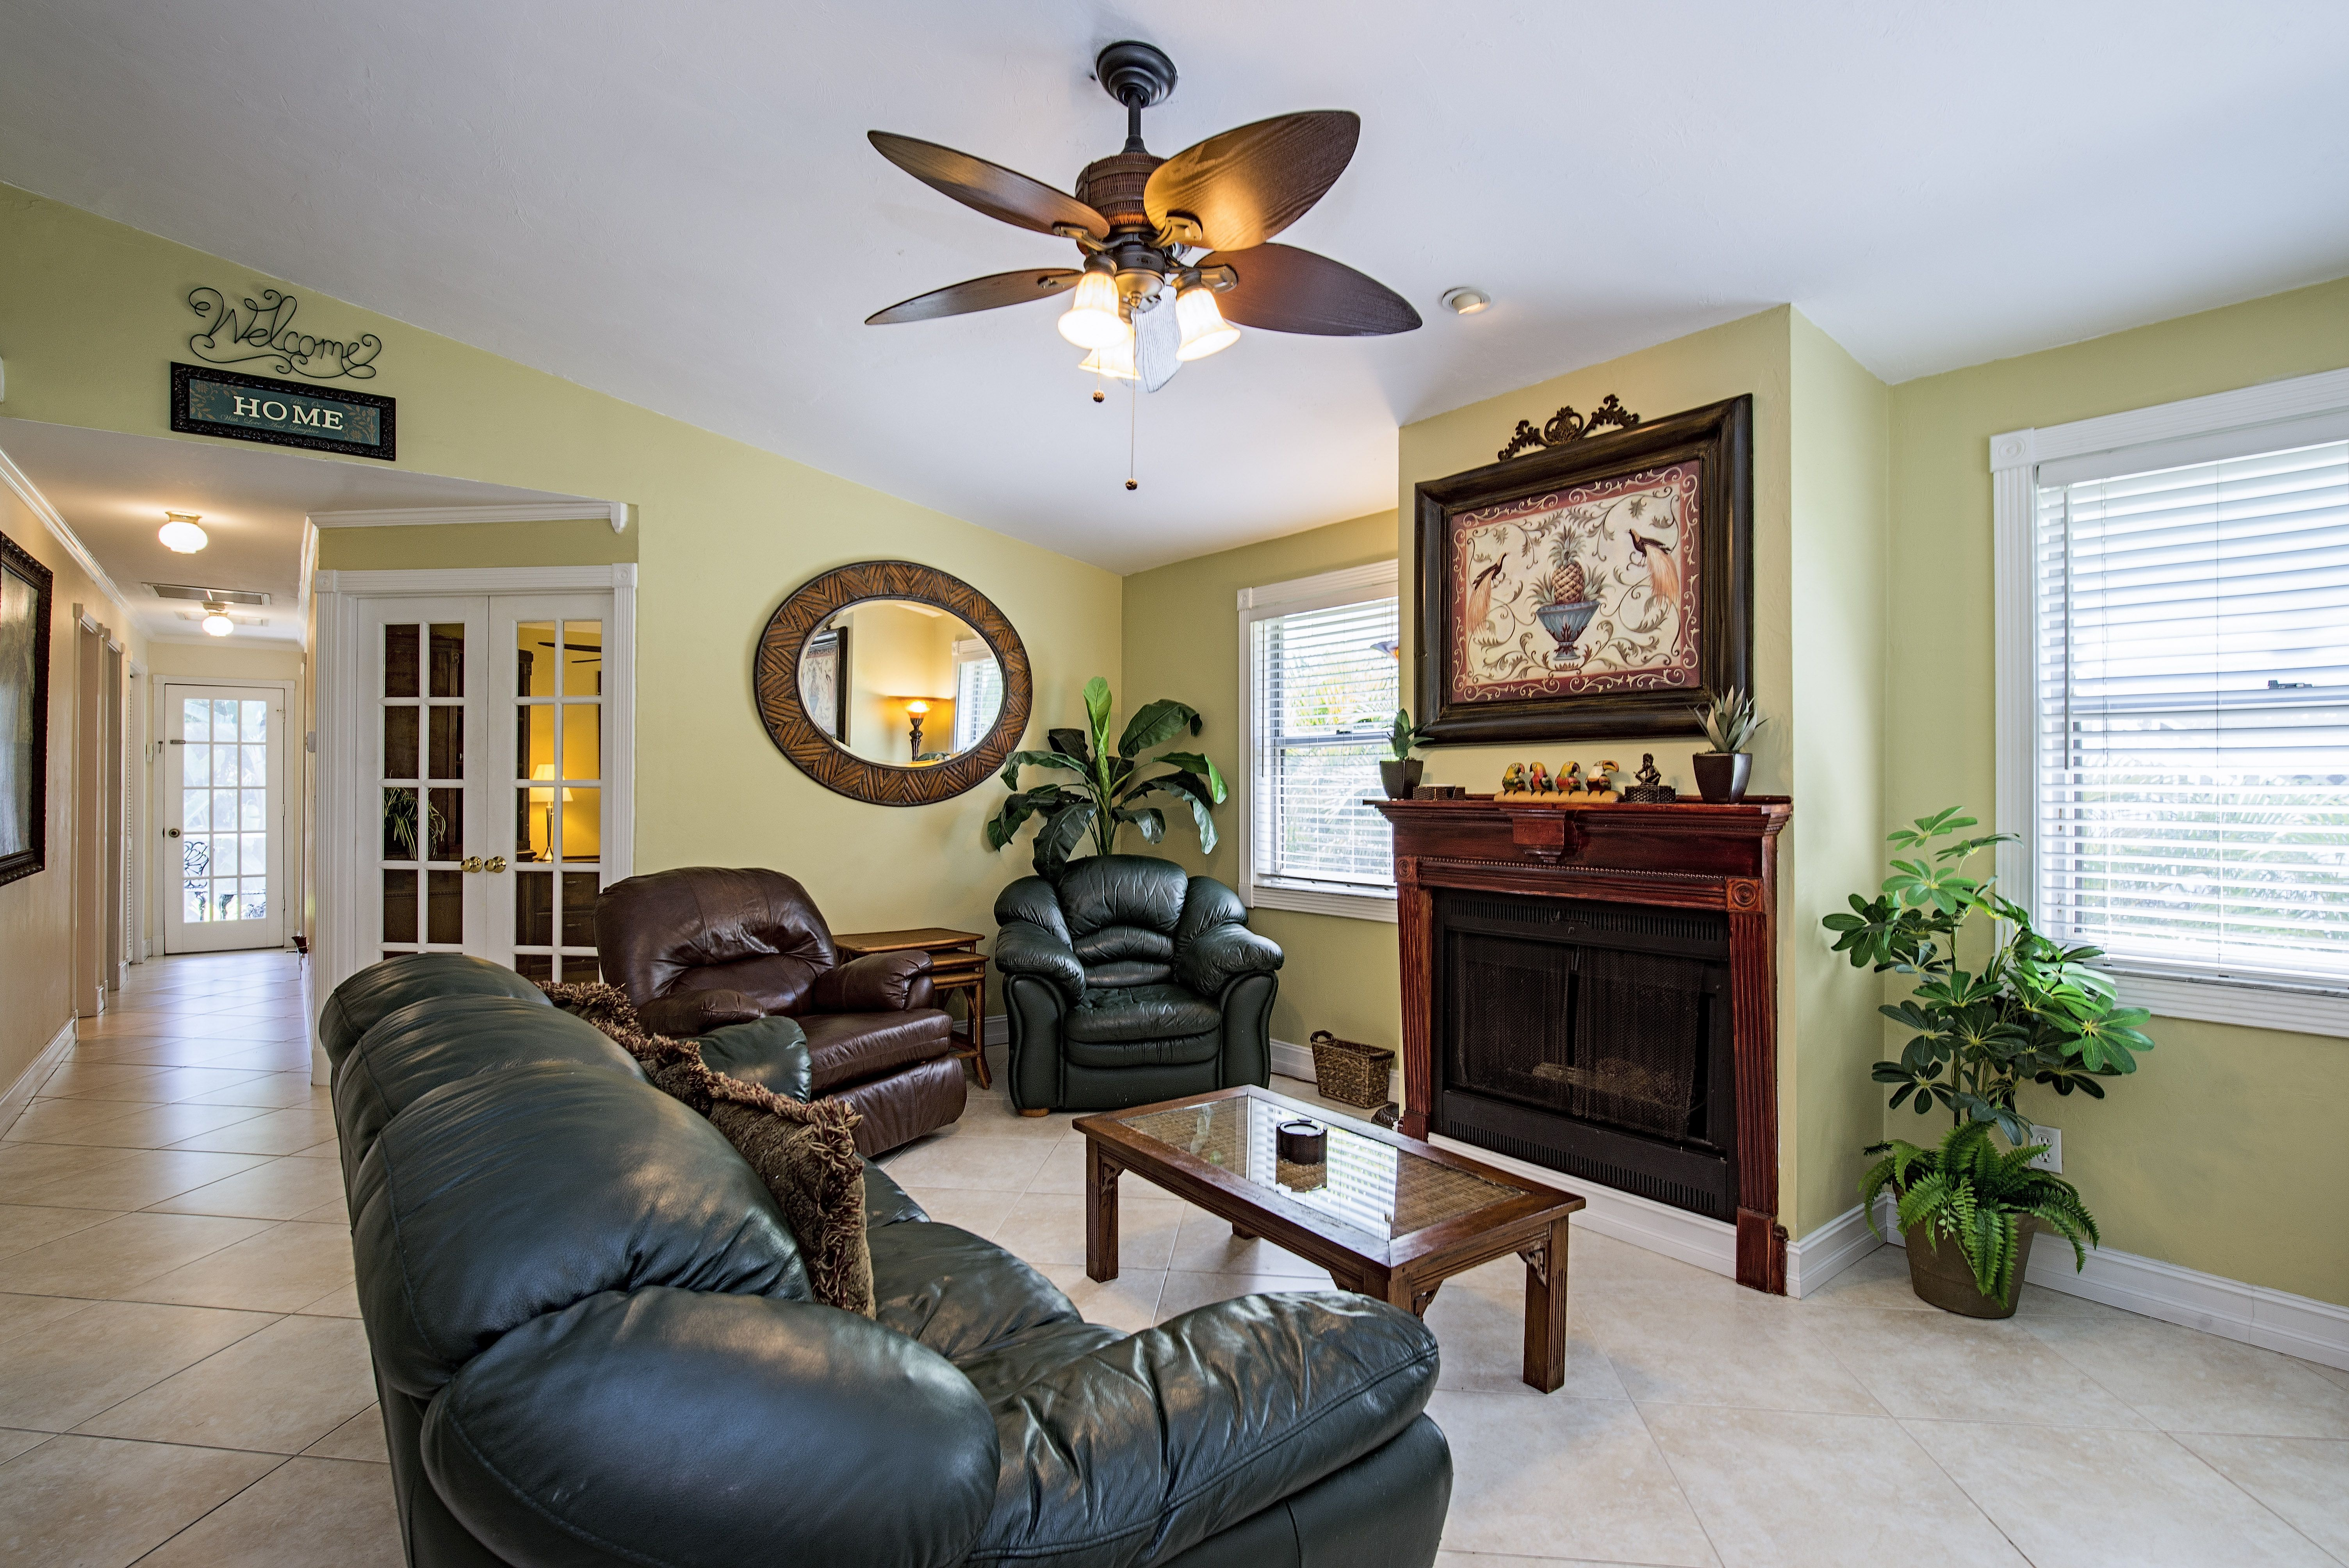 Open floor plan with ambient lighting, fireplace, vaulted